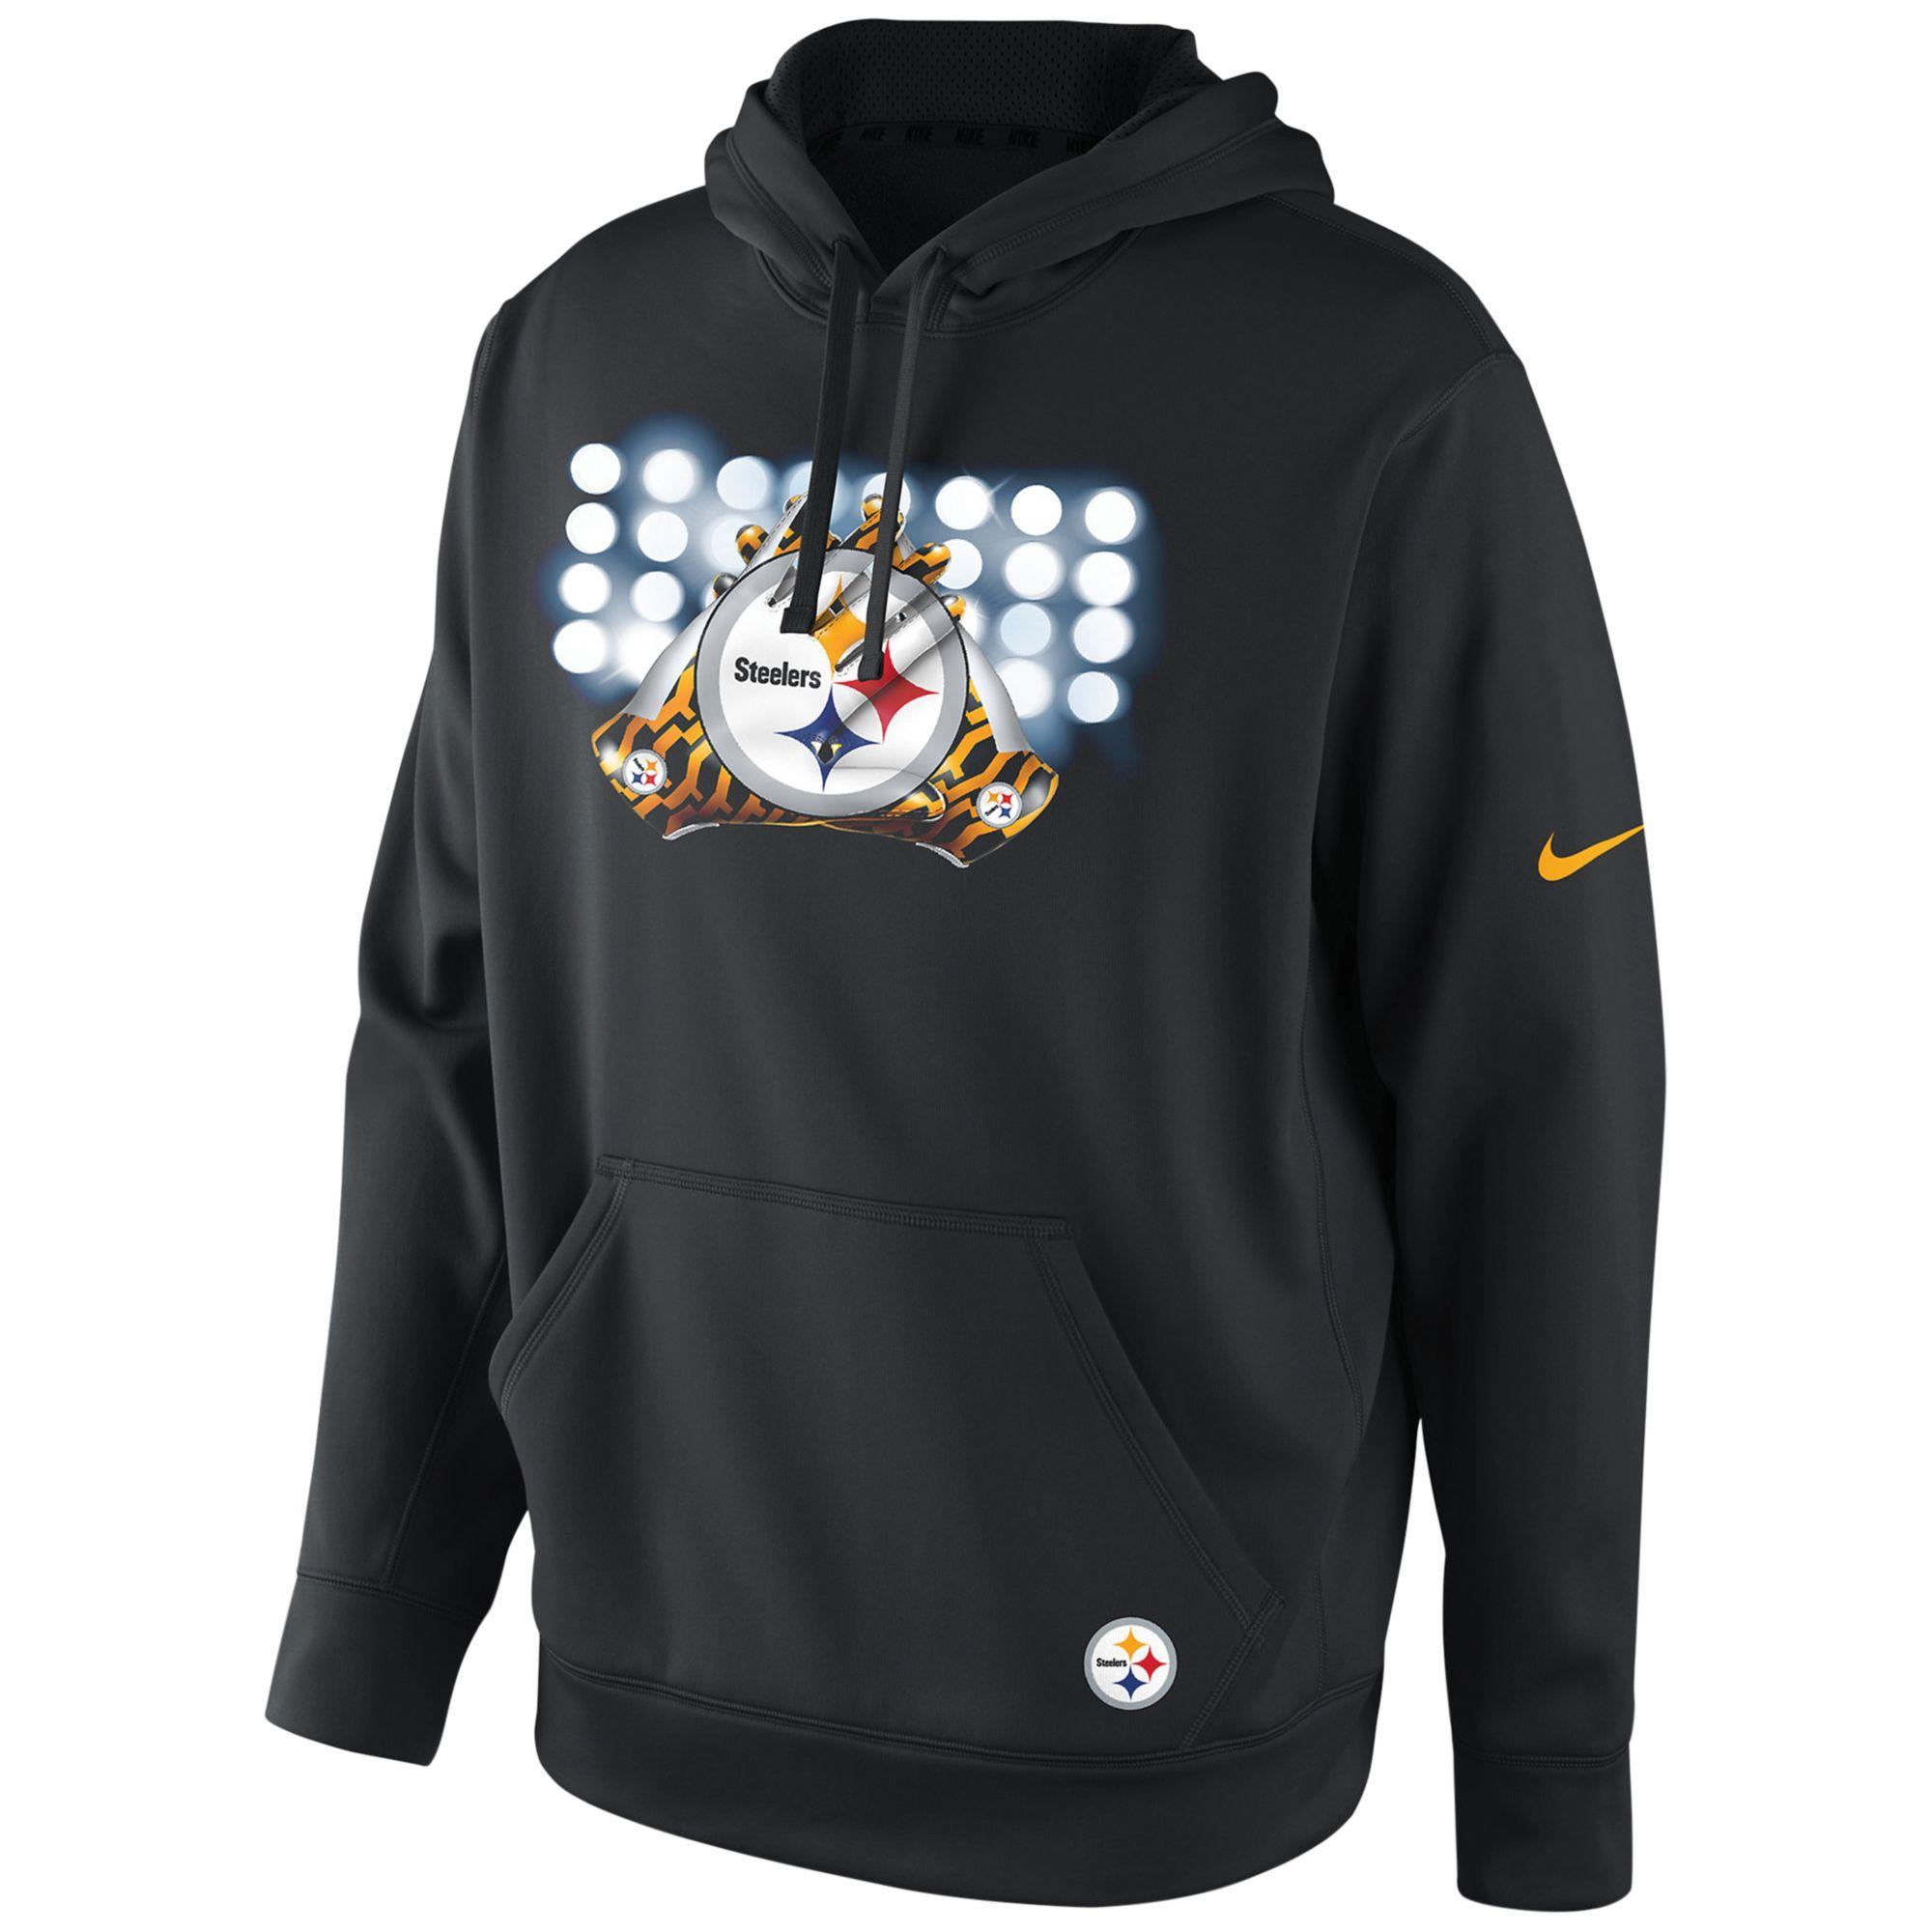 Steelers Sweaters